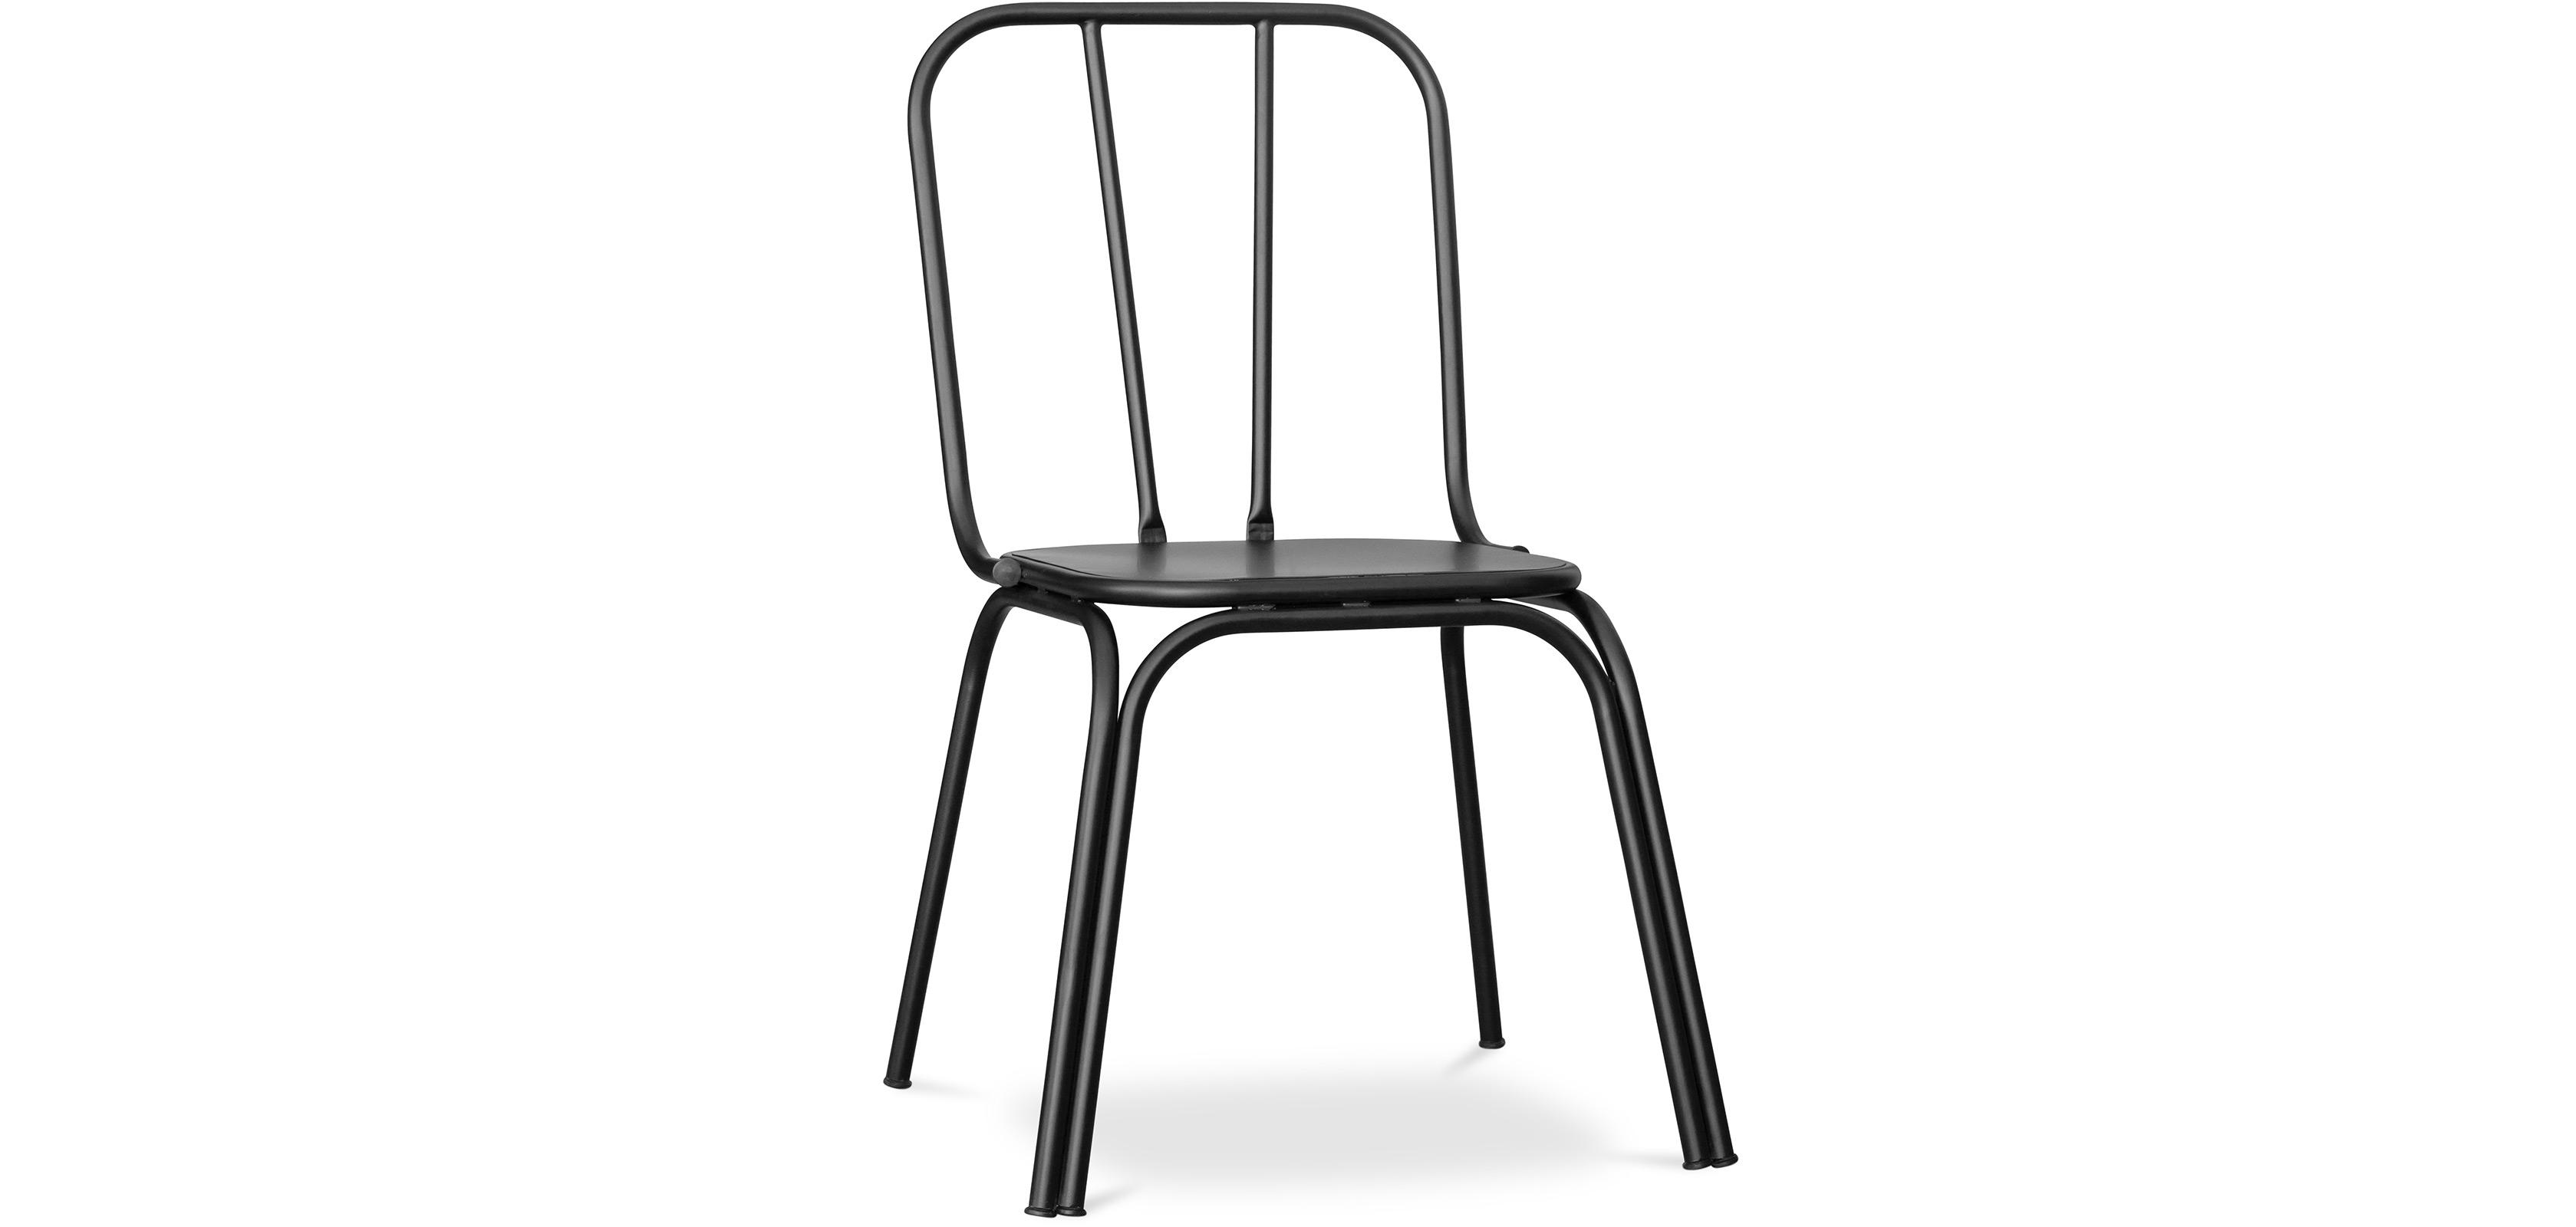 Buy Kira industrial style dining chair - Metal Black 59402 - in the UK